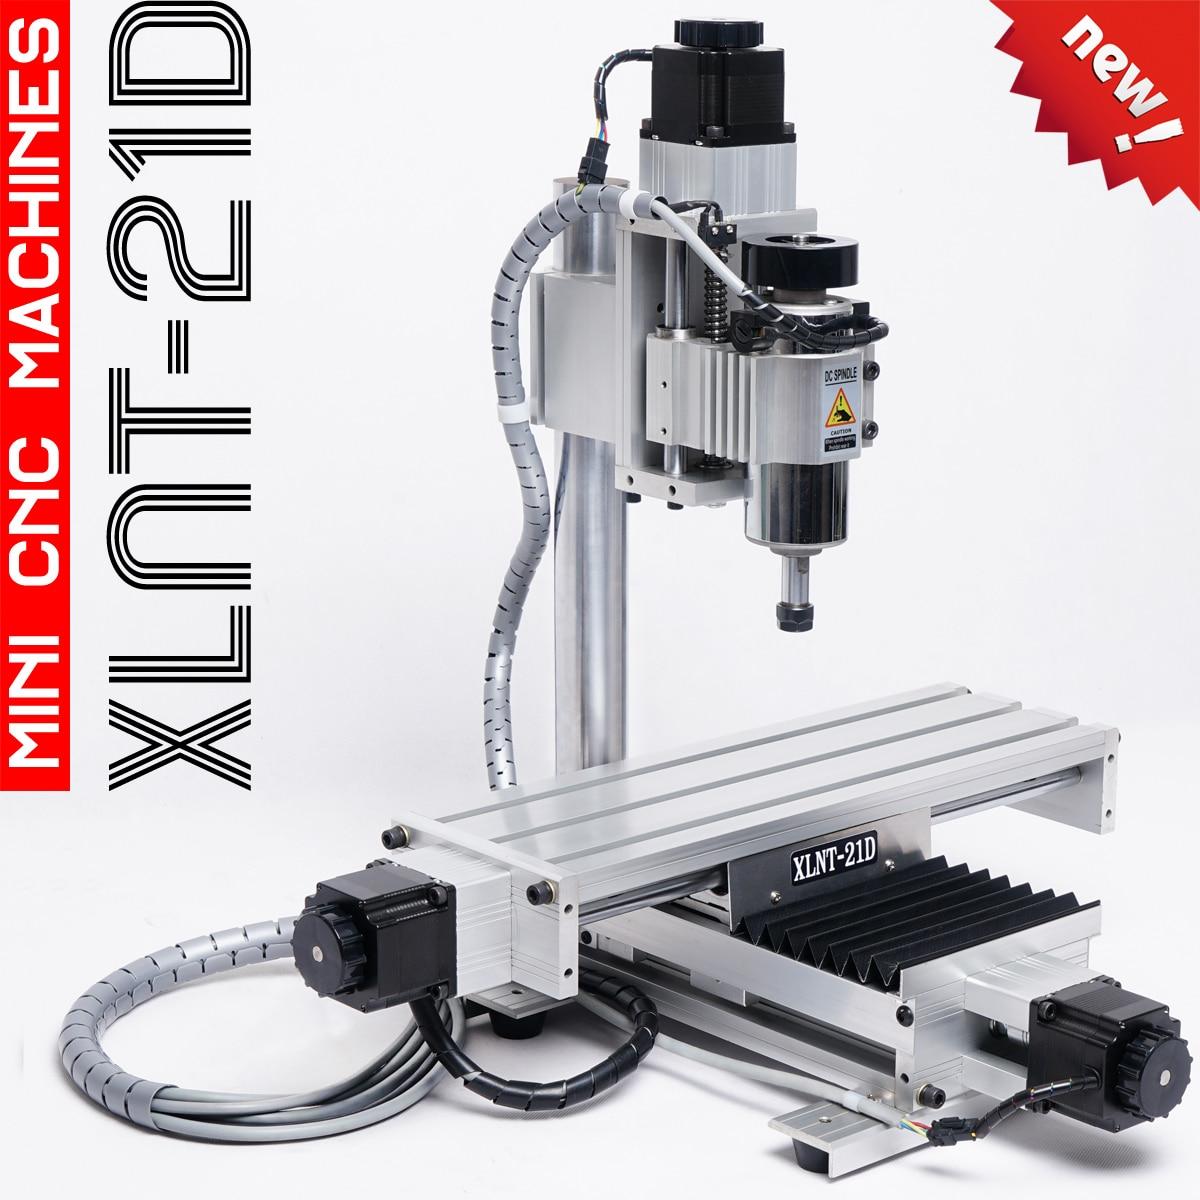 CNC Milling Machine XLNTCNC-21D  Mini Carving